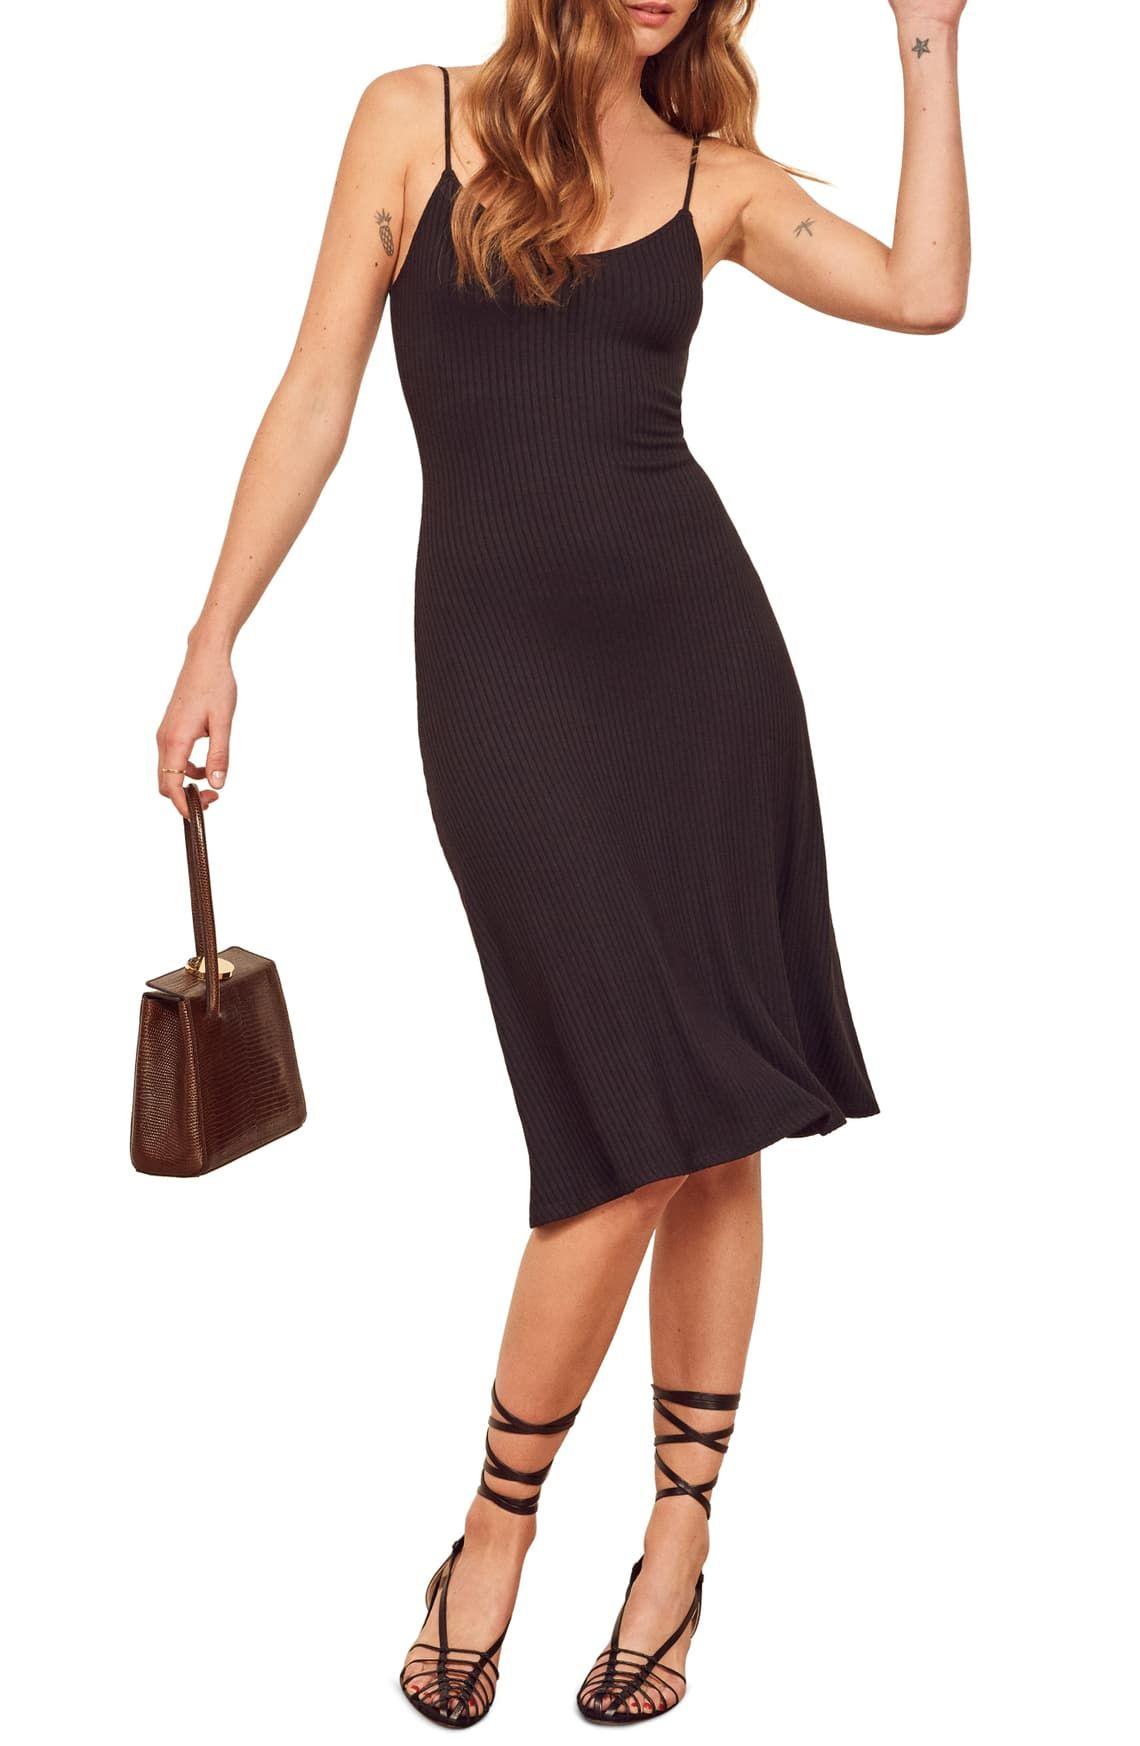 Reformation Shell Ribbed Dress Nordstrom Ribbed Dresses Trendy Cocktail Dresses Dresses [ 1746 x 1140 Pixel ]